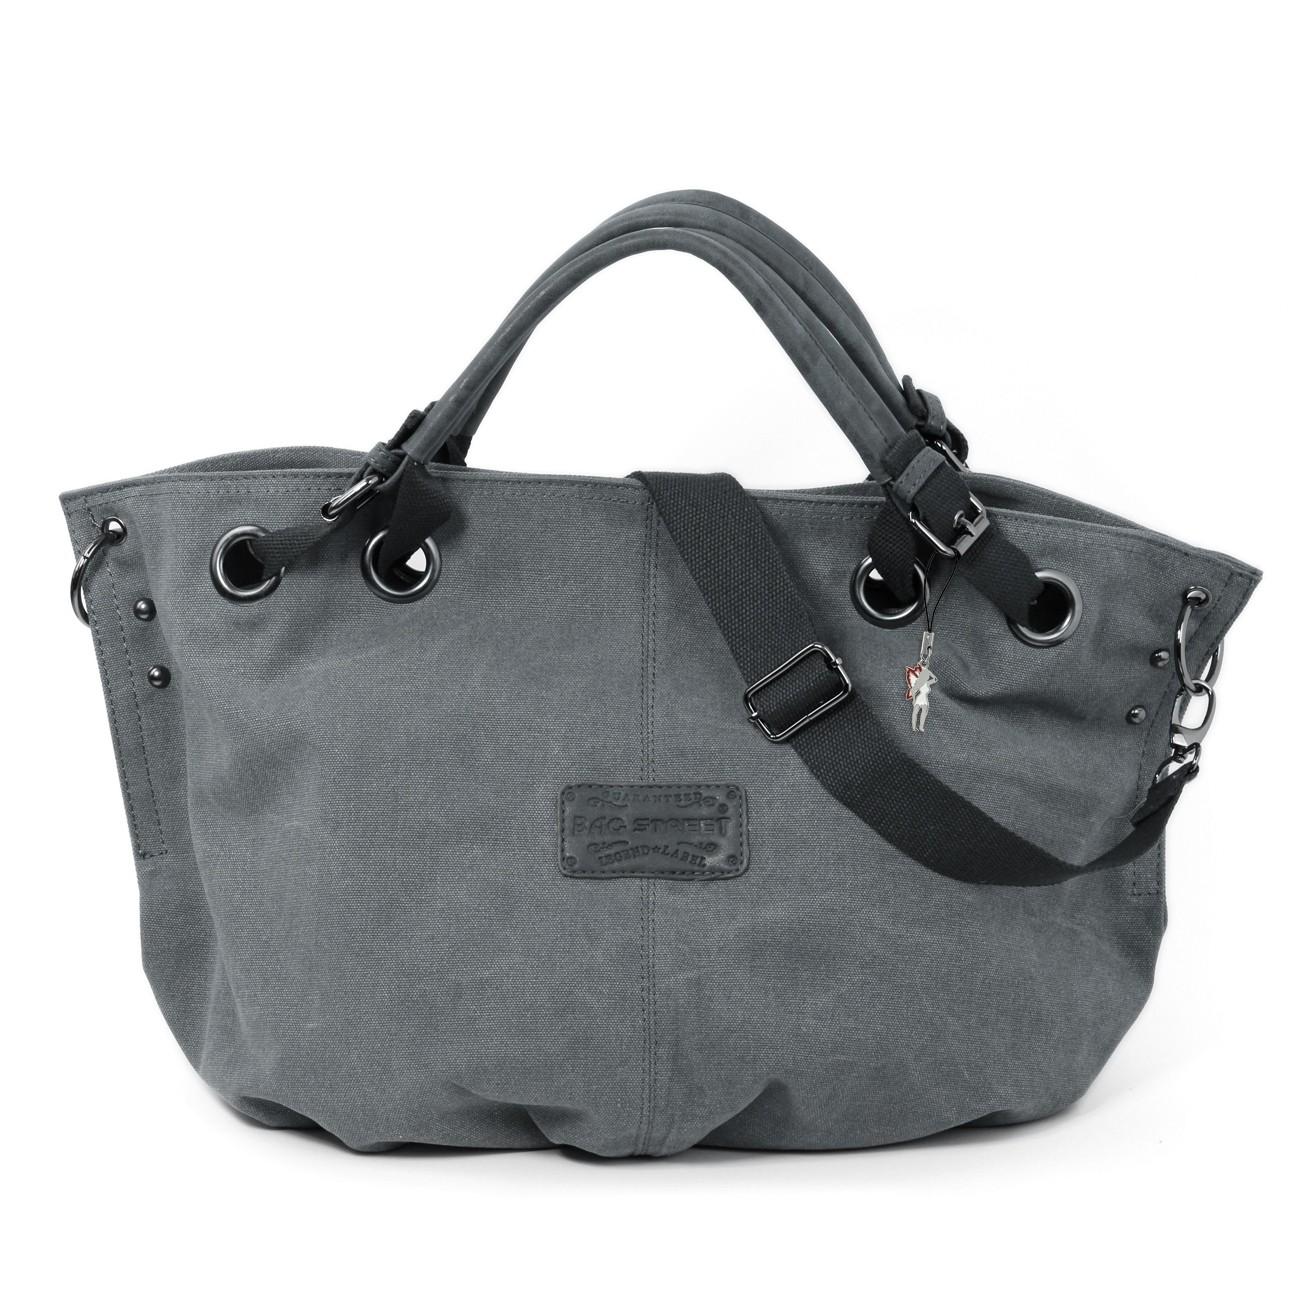 Beuteltasche Canvas grau Damen Hobo Shopper Handtasche Bag Street OTJ213K